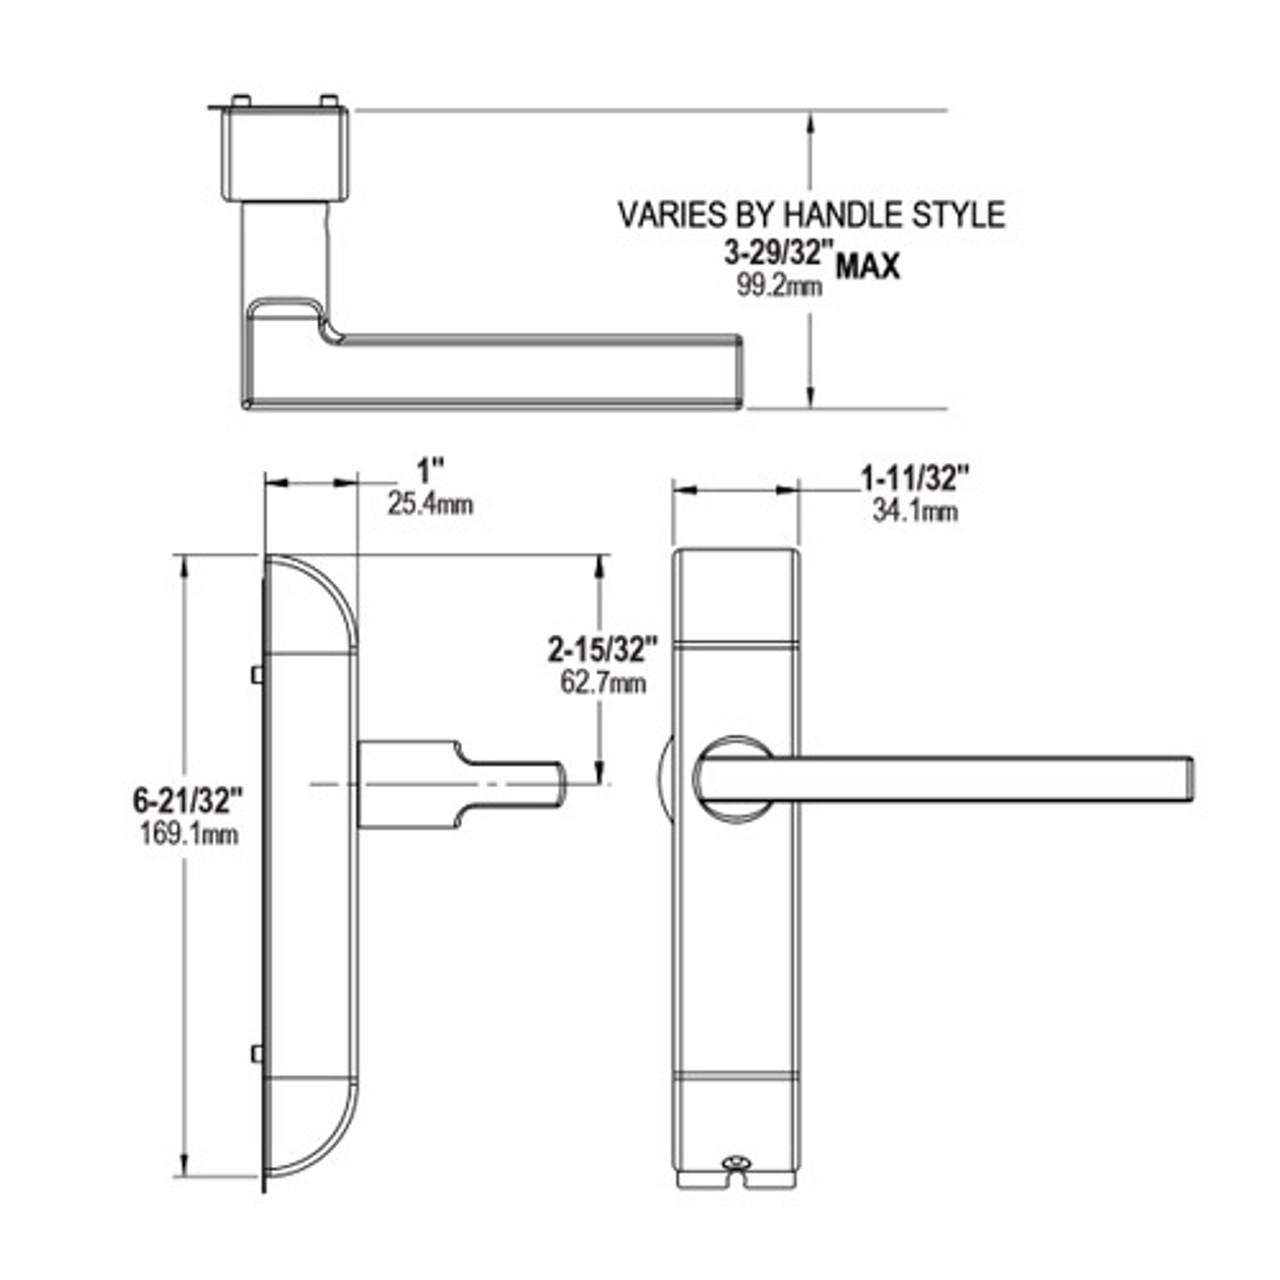 4600M-MV-522-US3 Adams Rite MV Designer handle Dimensional View